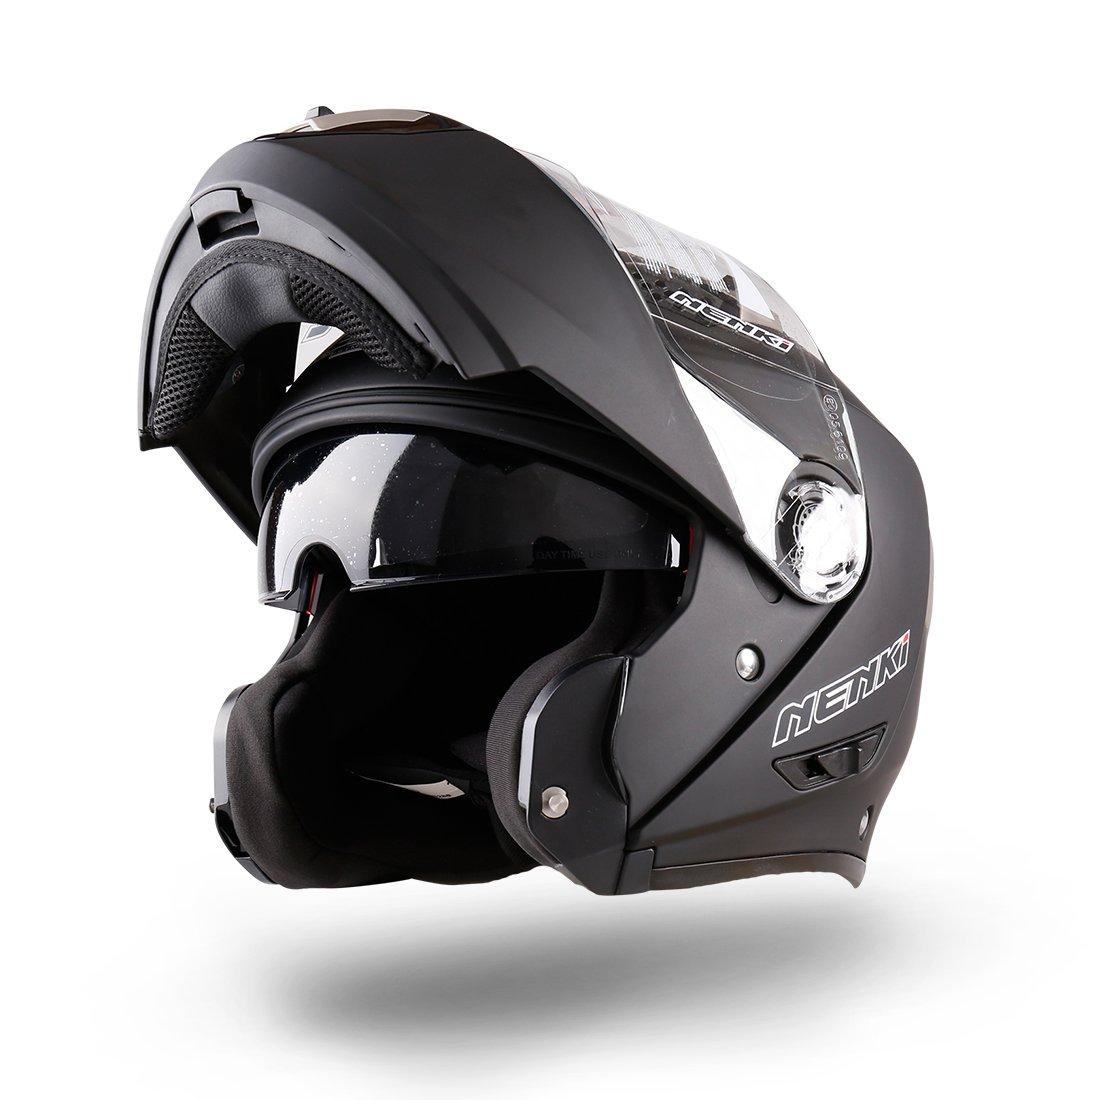 NENKI NK-860 Motorbike Helmet Motorcycle Moped Scooter Flip Up Modular Crash Helmets (M, Black)